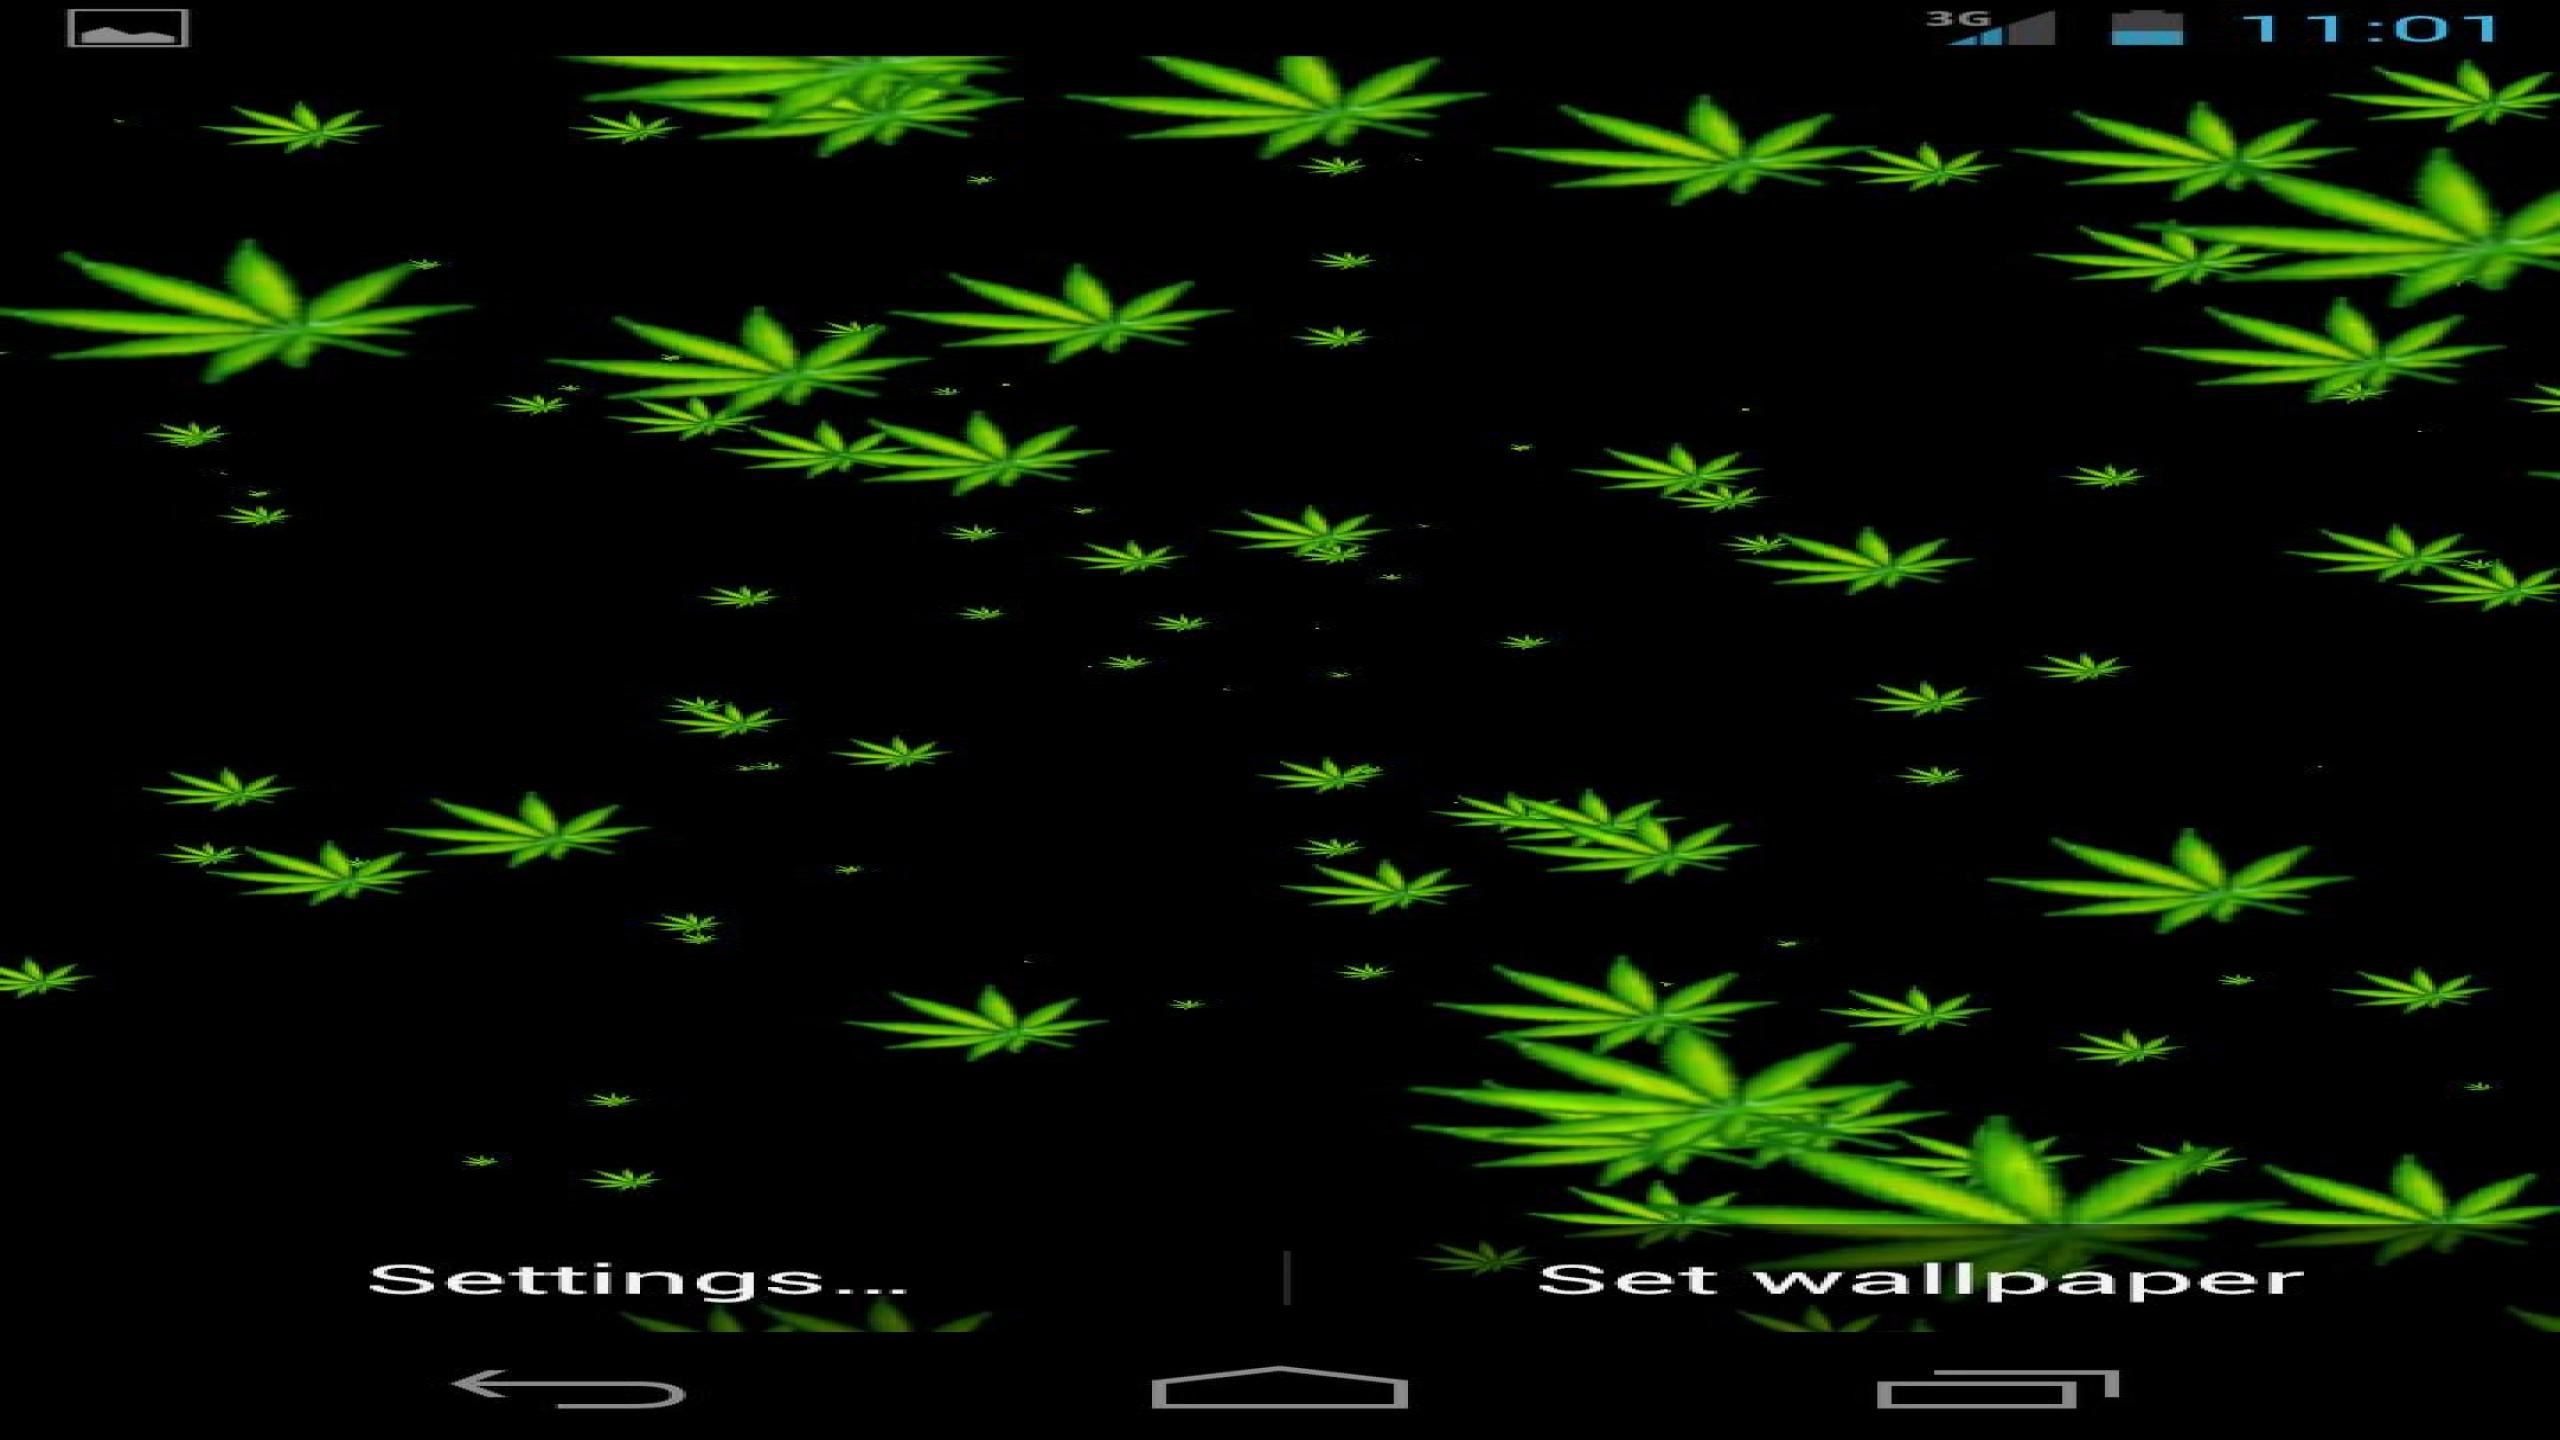 Download free weed wallpapers wallpapersafari - Free marijuana desktop backgrounds ...